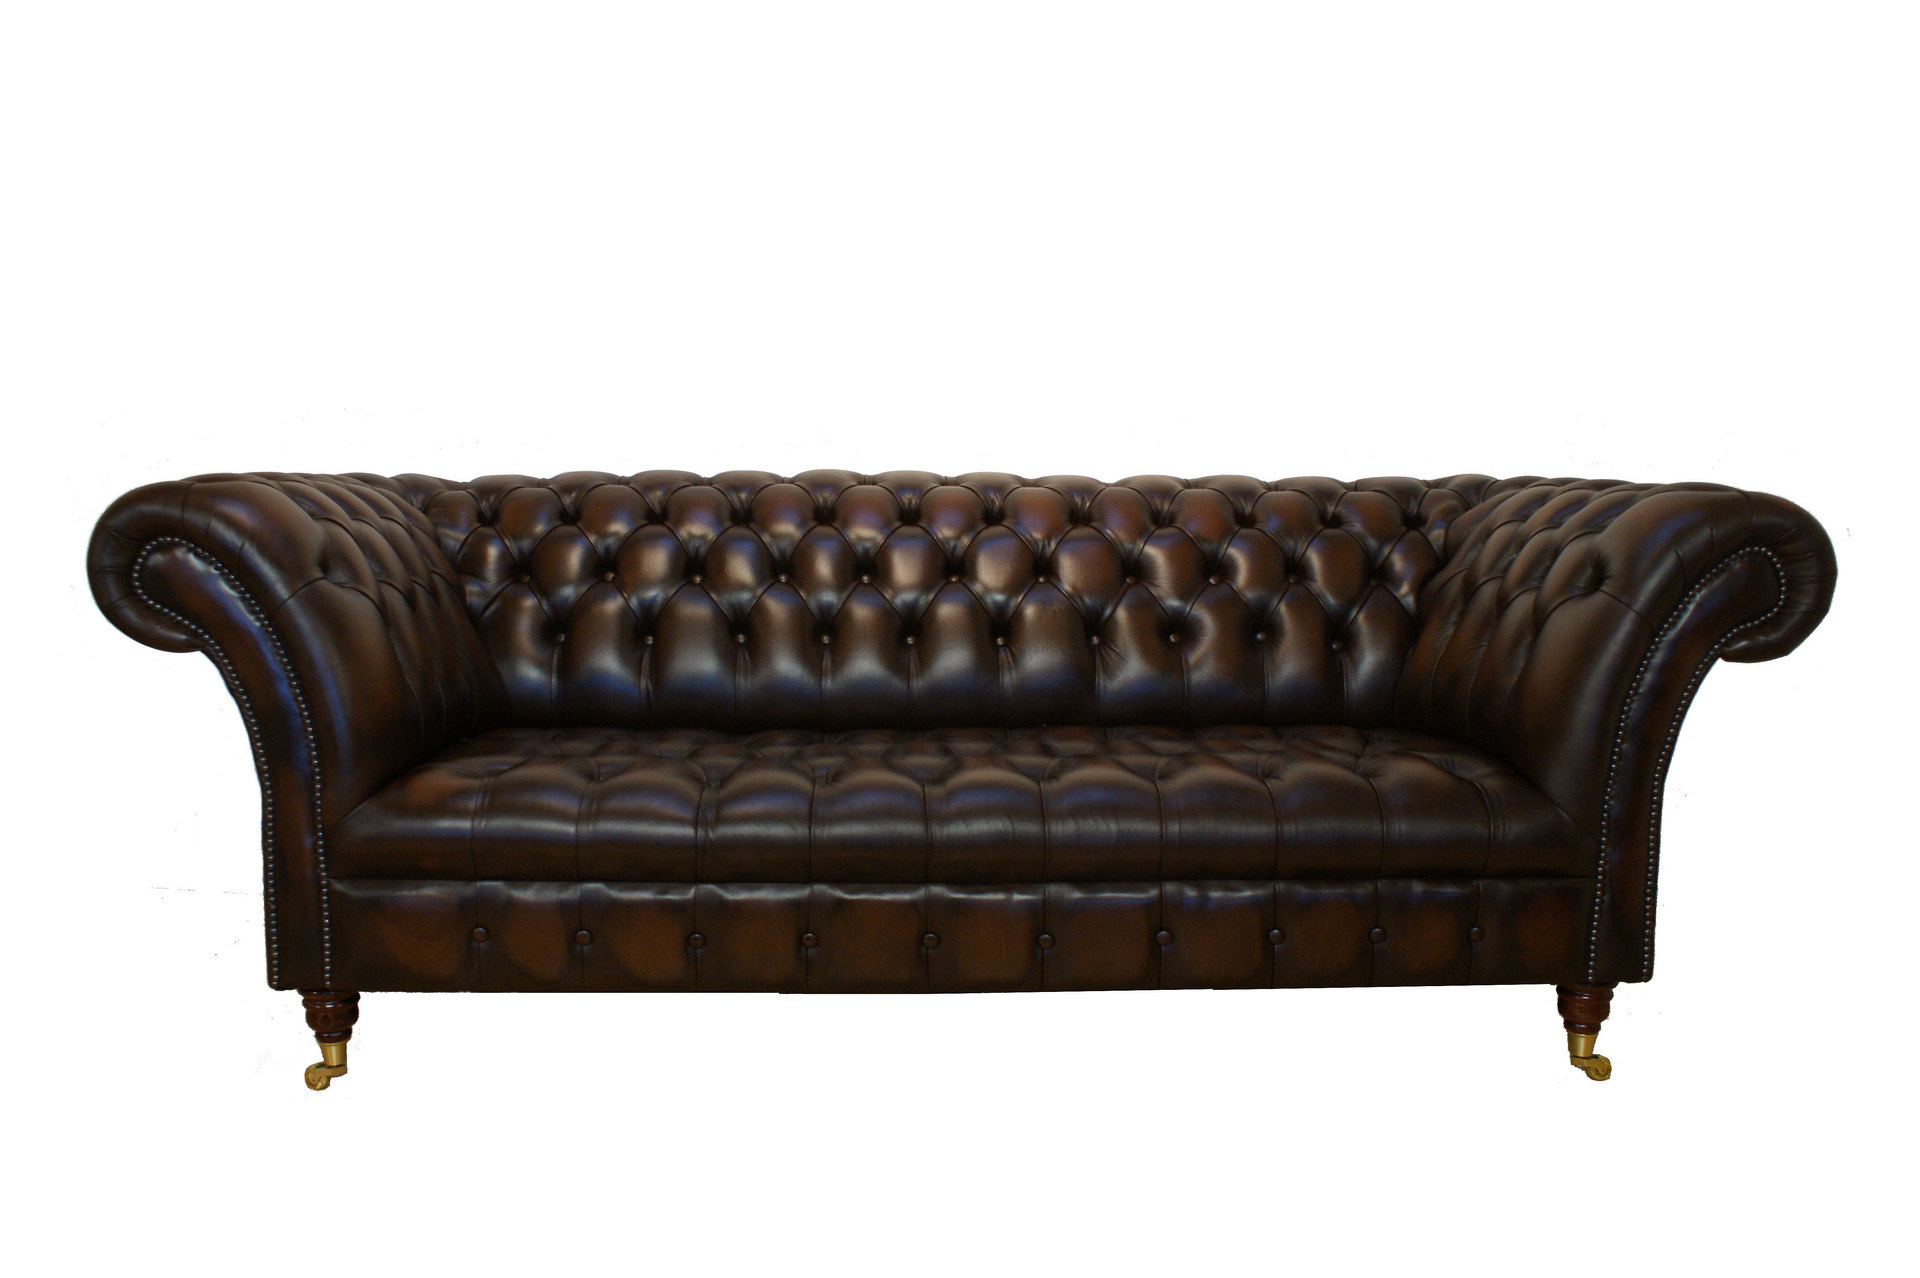 How To Buy A Cheap Chesterfield Sofa Designersofas4u Blog